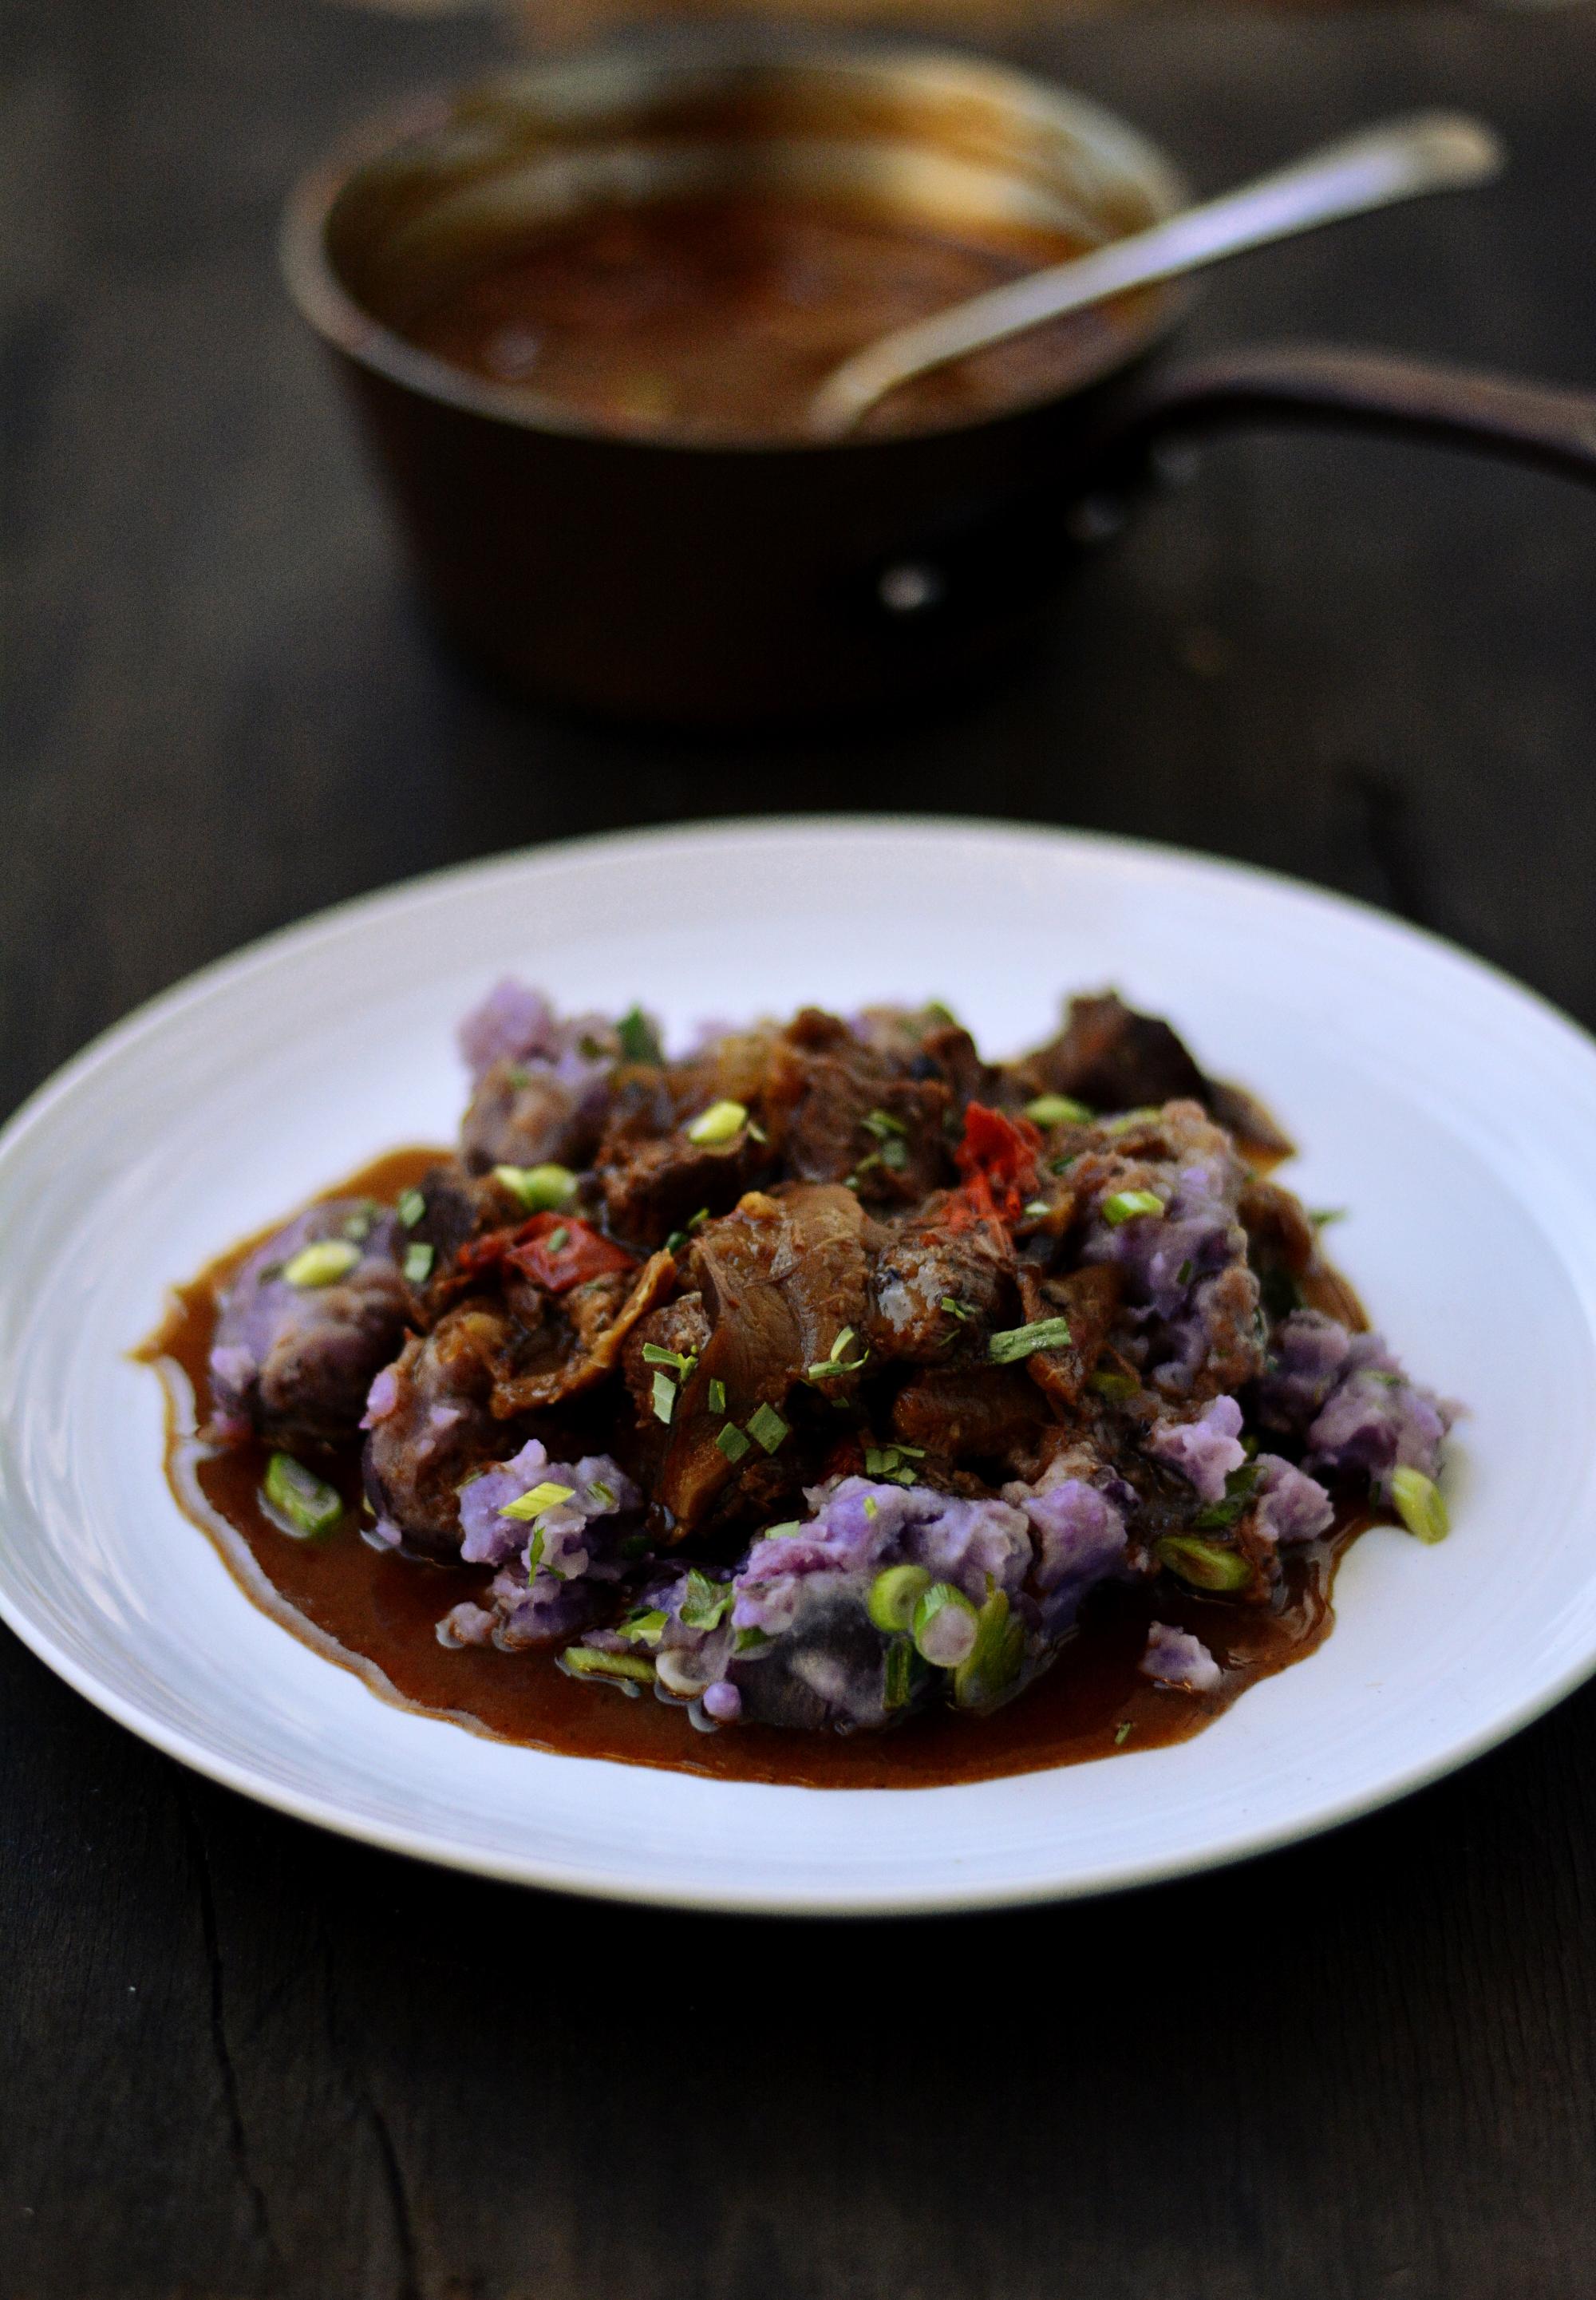 ox-cheek-stew-with-purple-potatoes